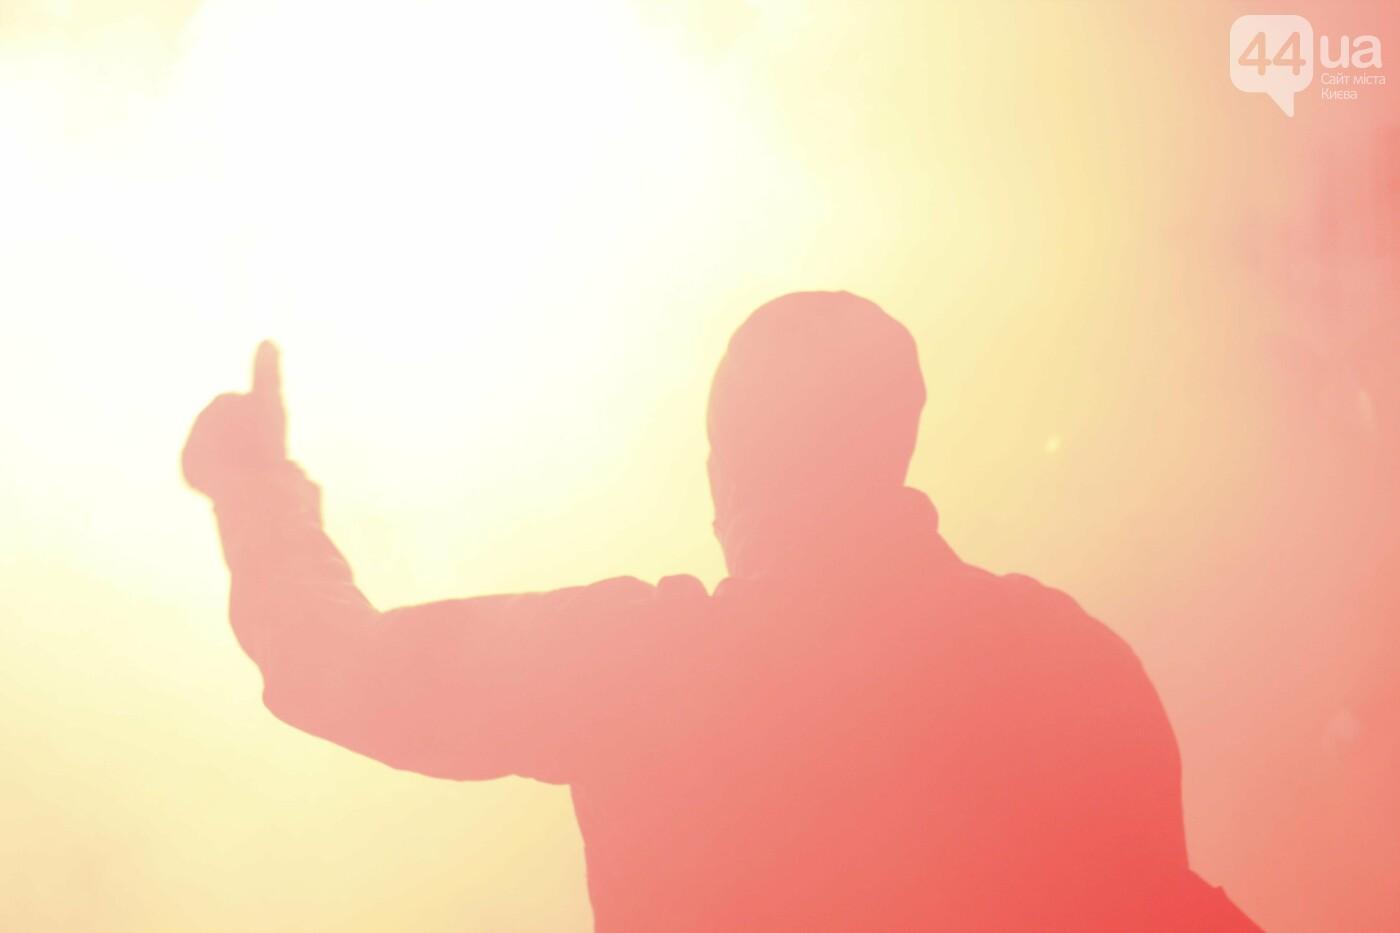 Сожгли табличку и разбили окна: акция в поддержку Стерненко переросла в беспорядки, - ФОТО, фото-9, Фото: 44.ua